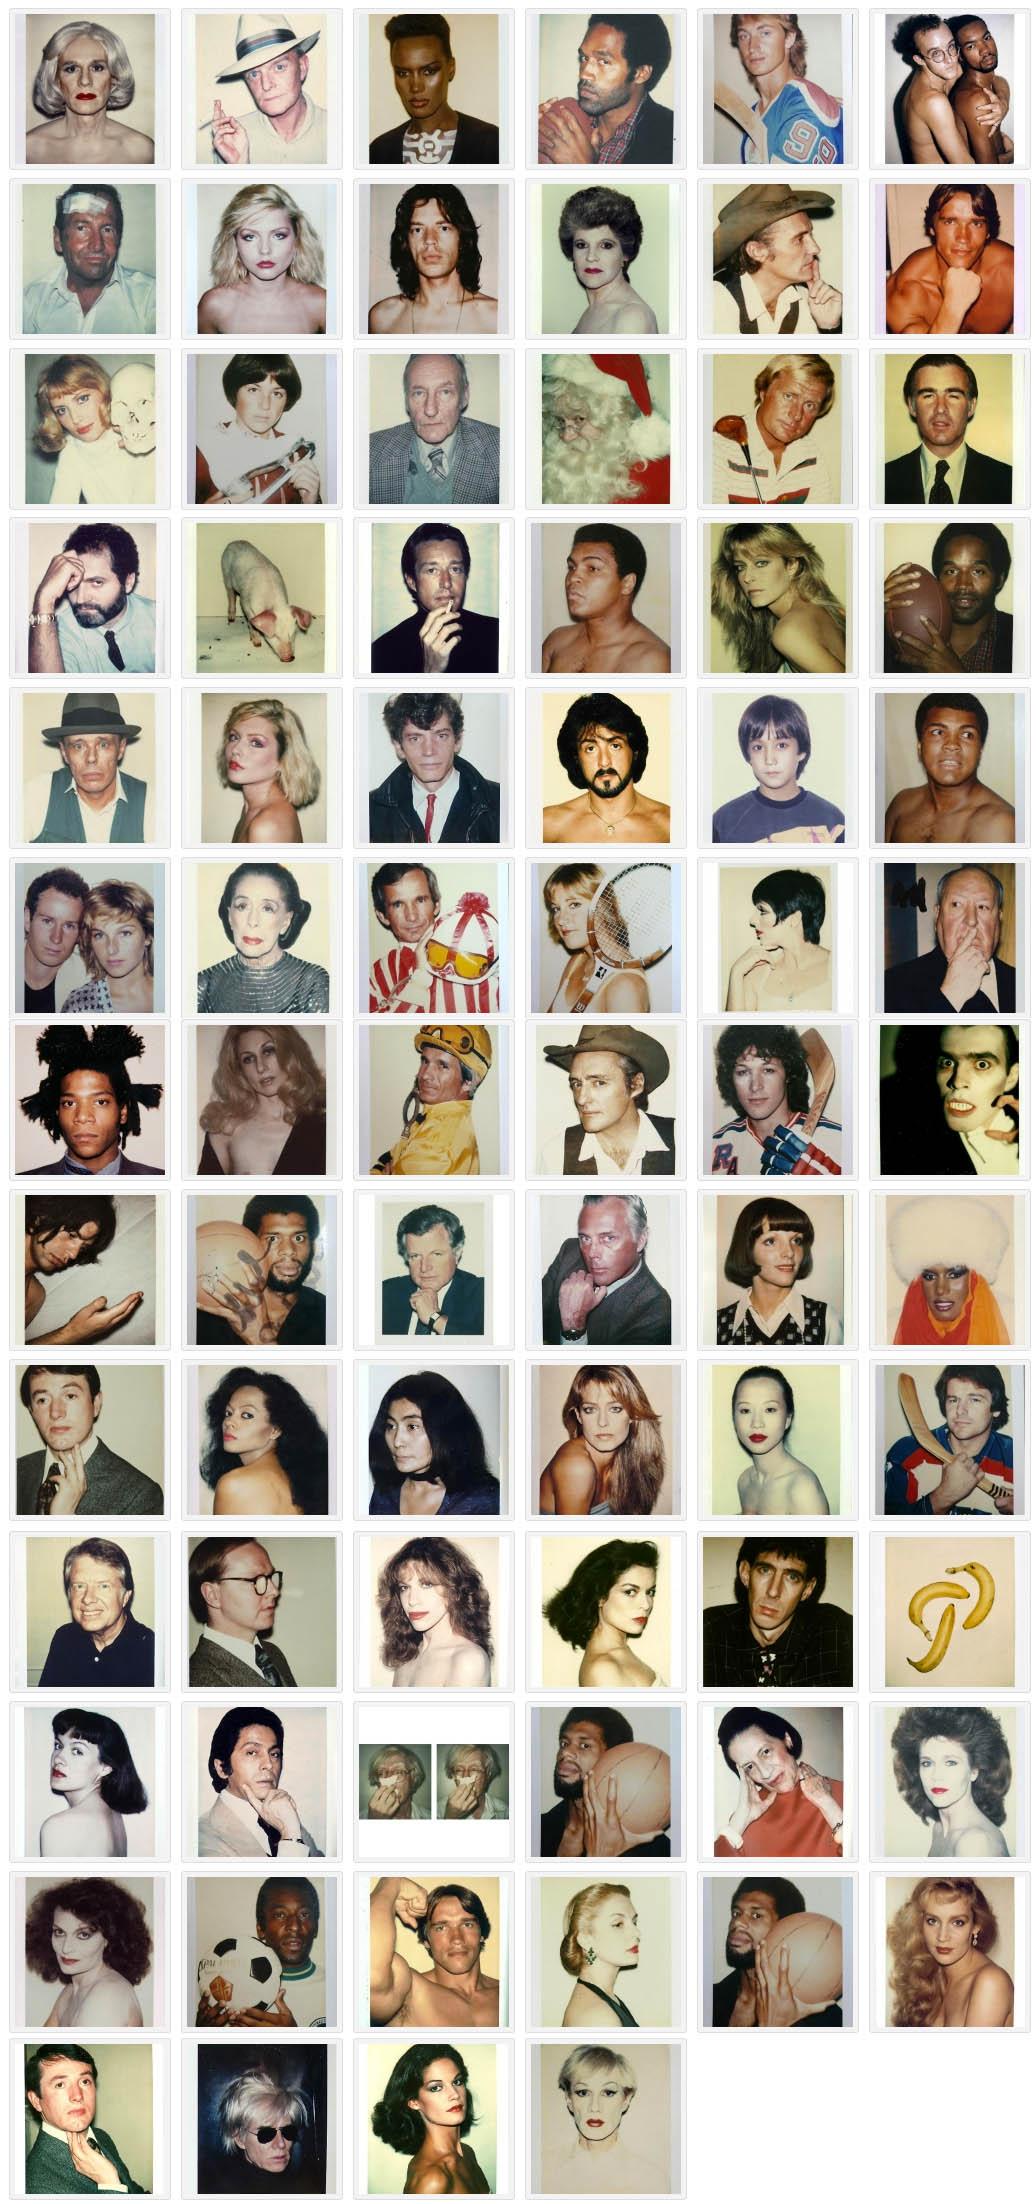 Warholpolaroids.jpg